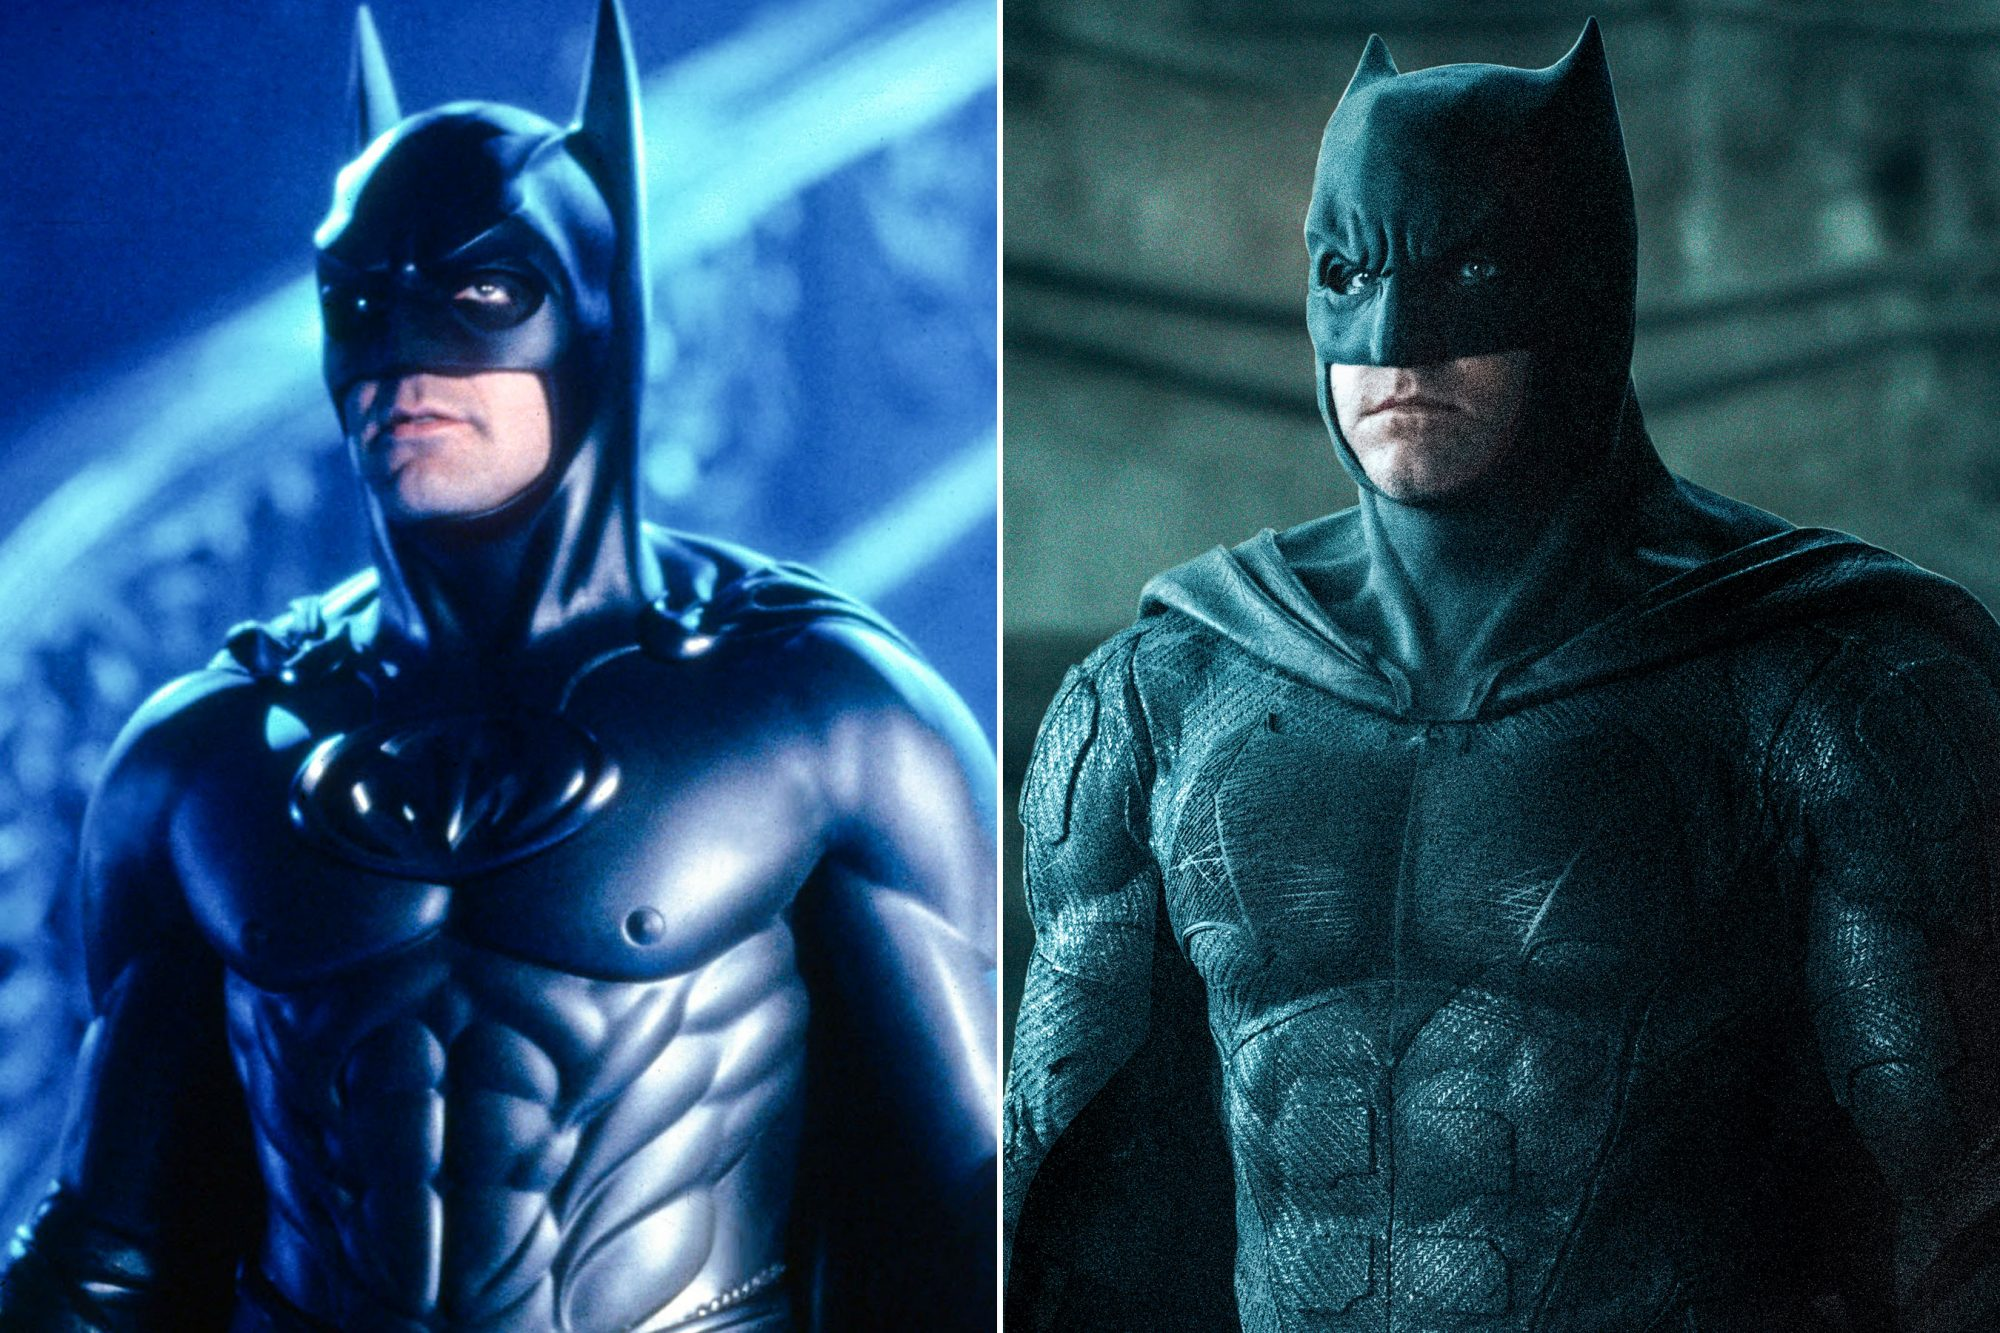 BATMAN and ROBIN; JUSTICE LEAGUE